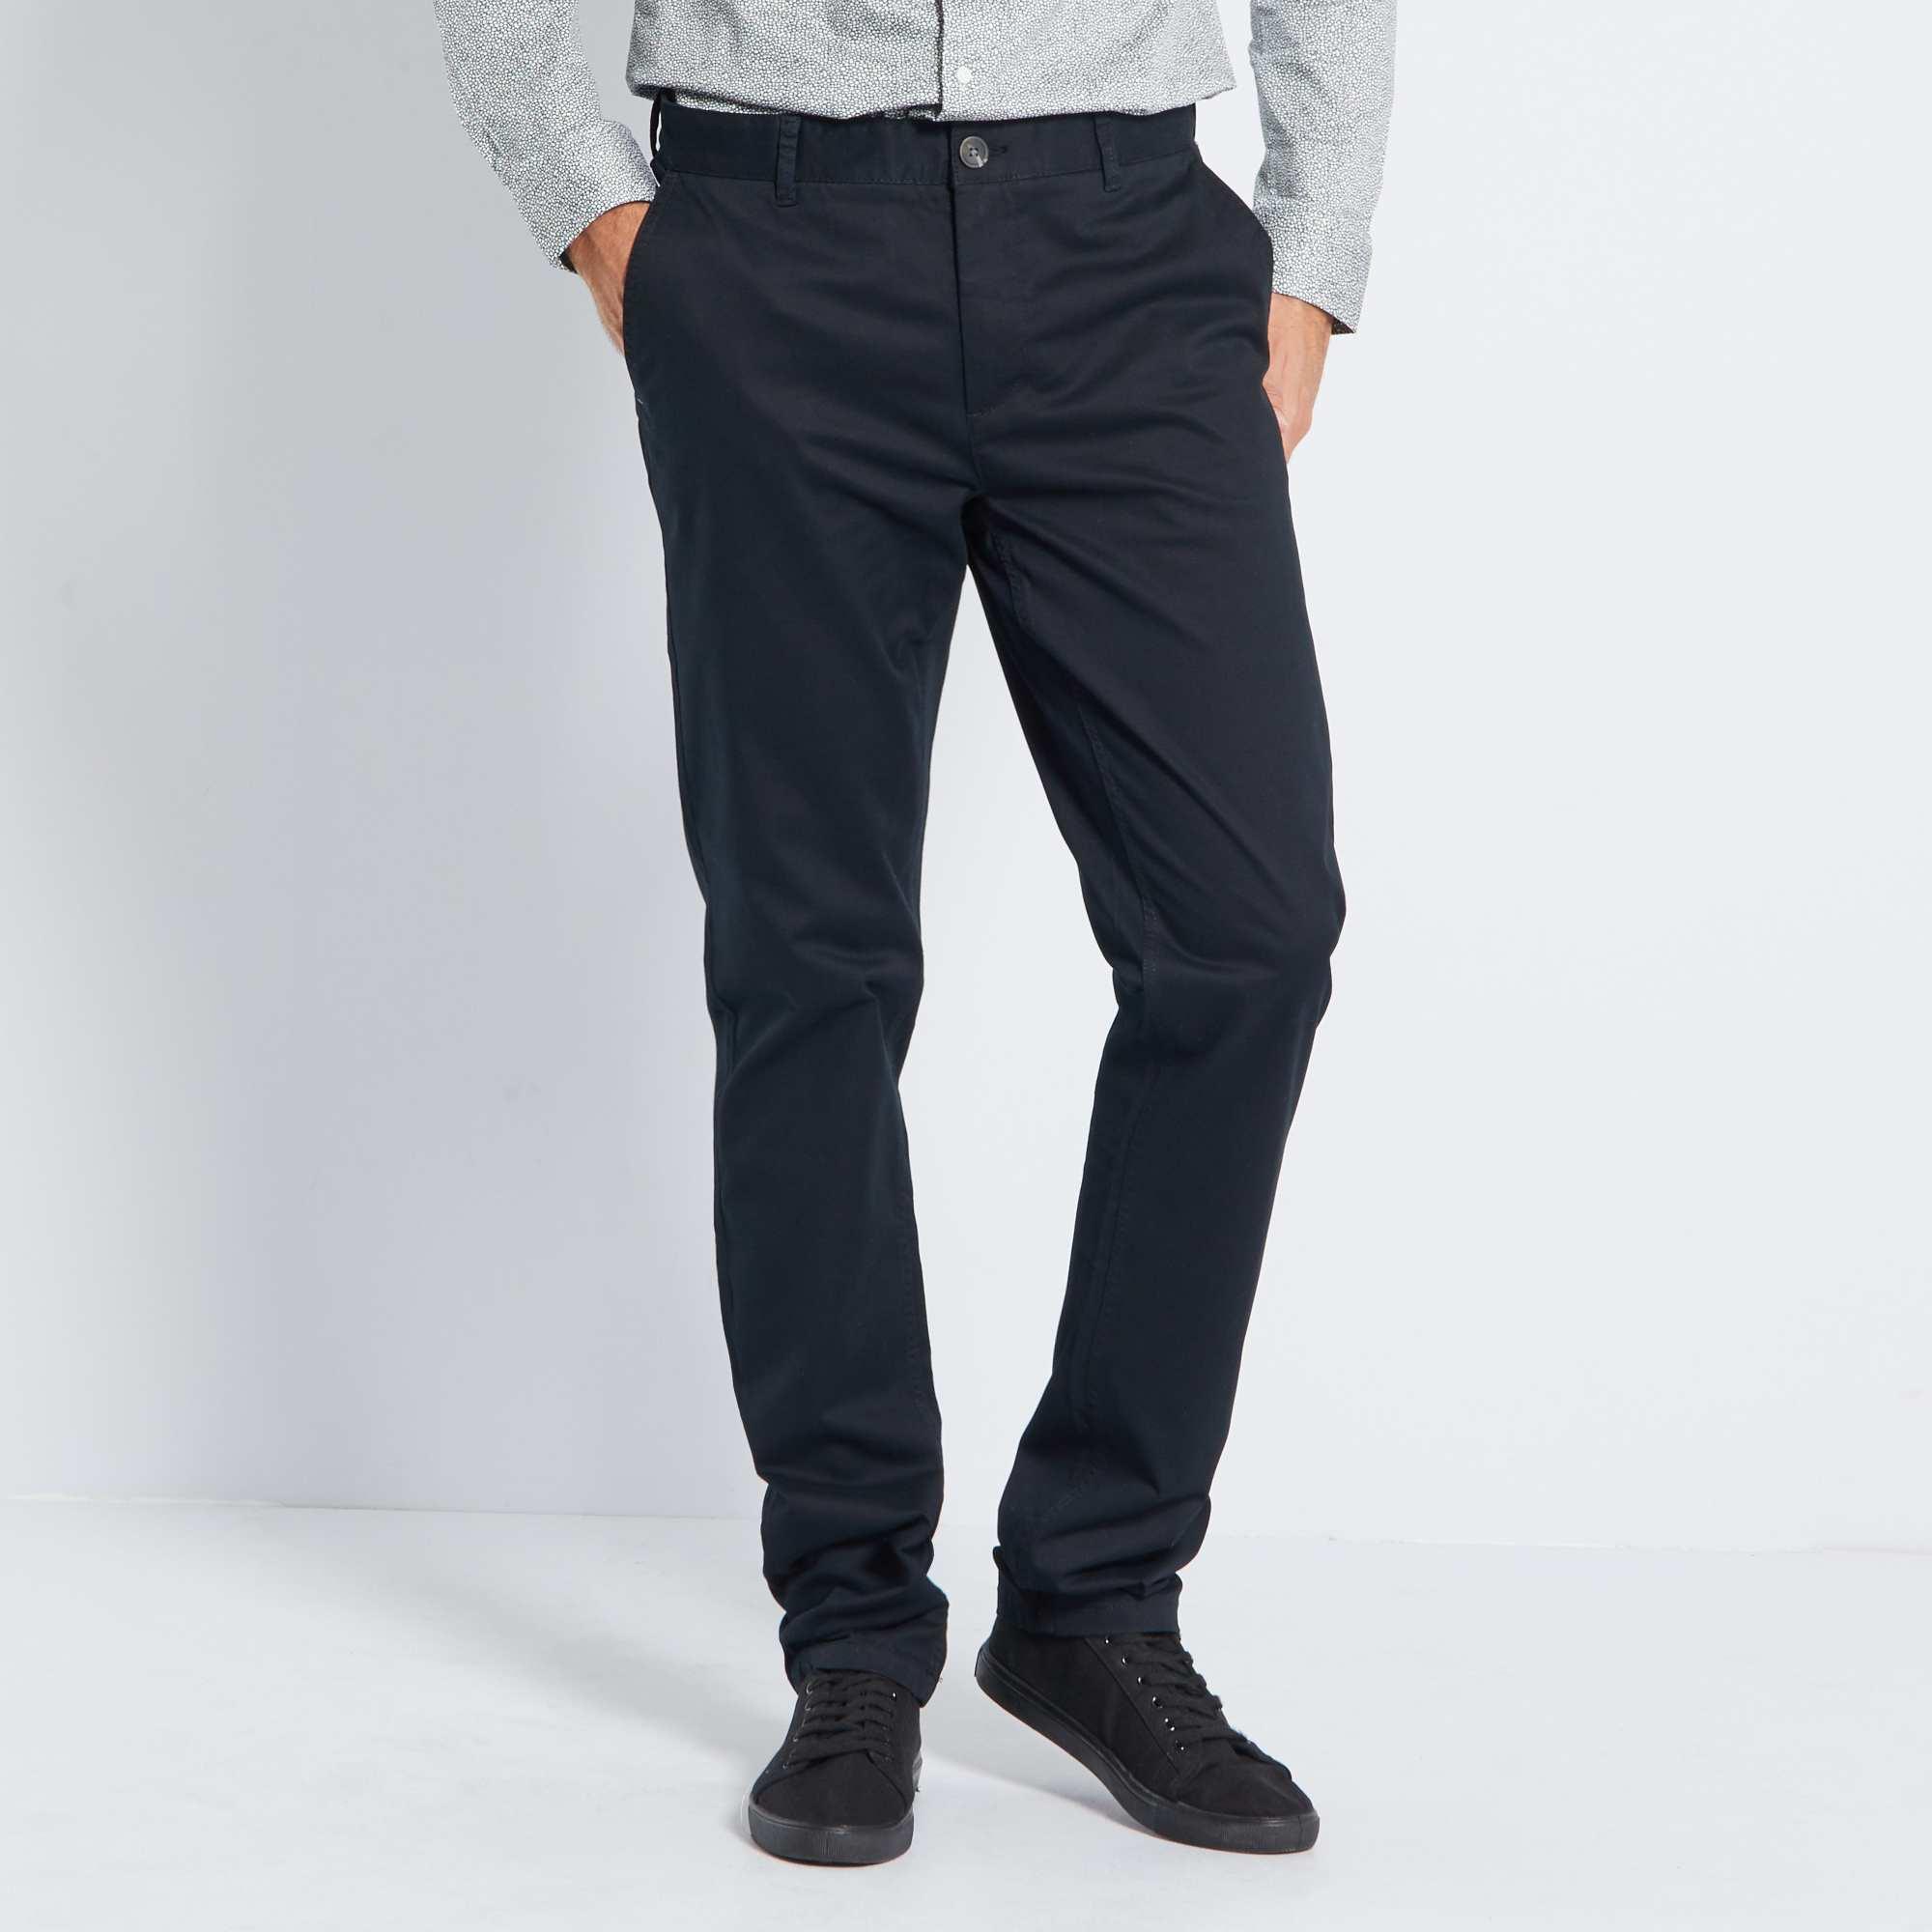 pantalon chino slim pur coton l36 1m90 homme noir kiabi 22 00. Black Bedroom Furniture Sets. Home Design Ideas